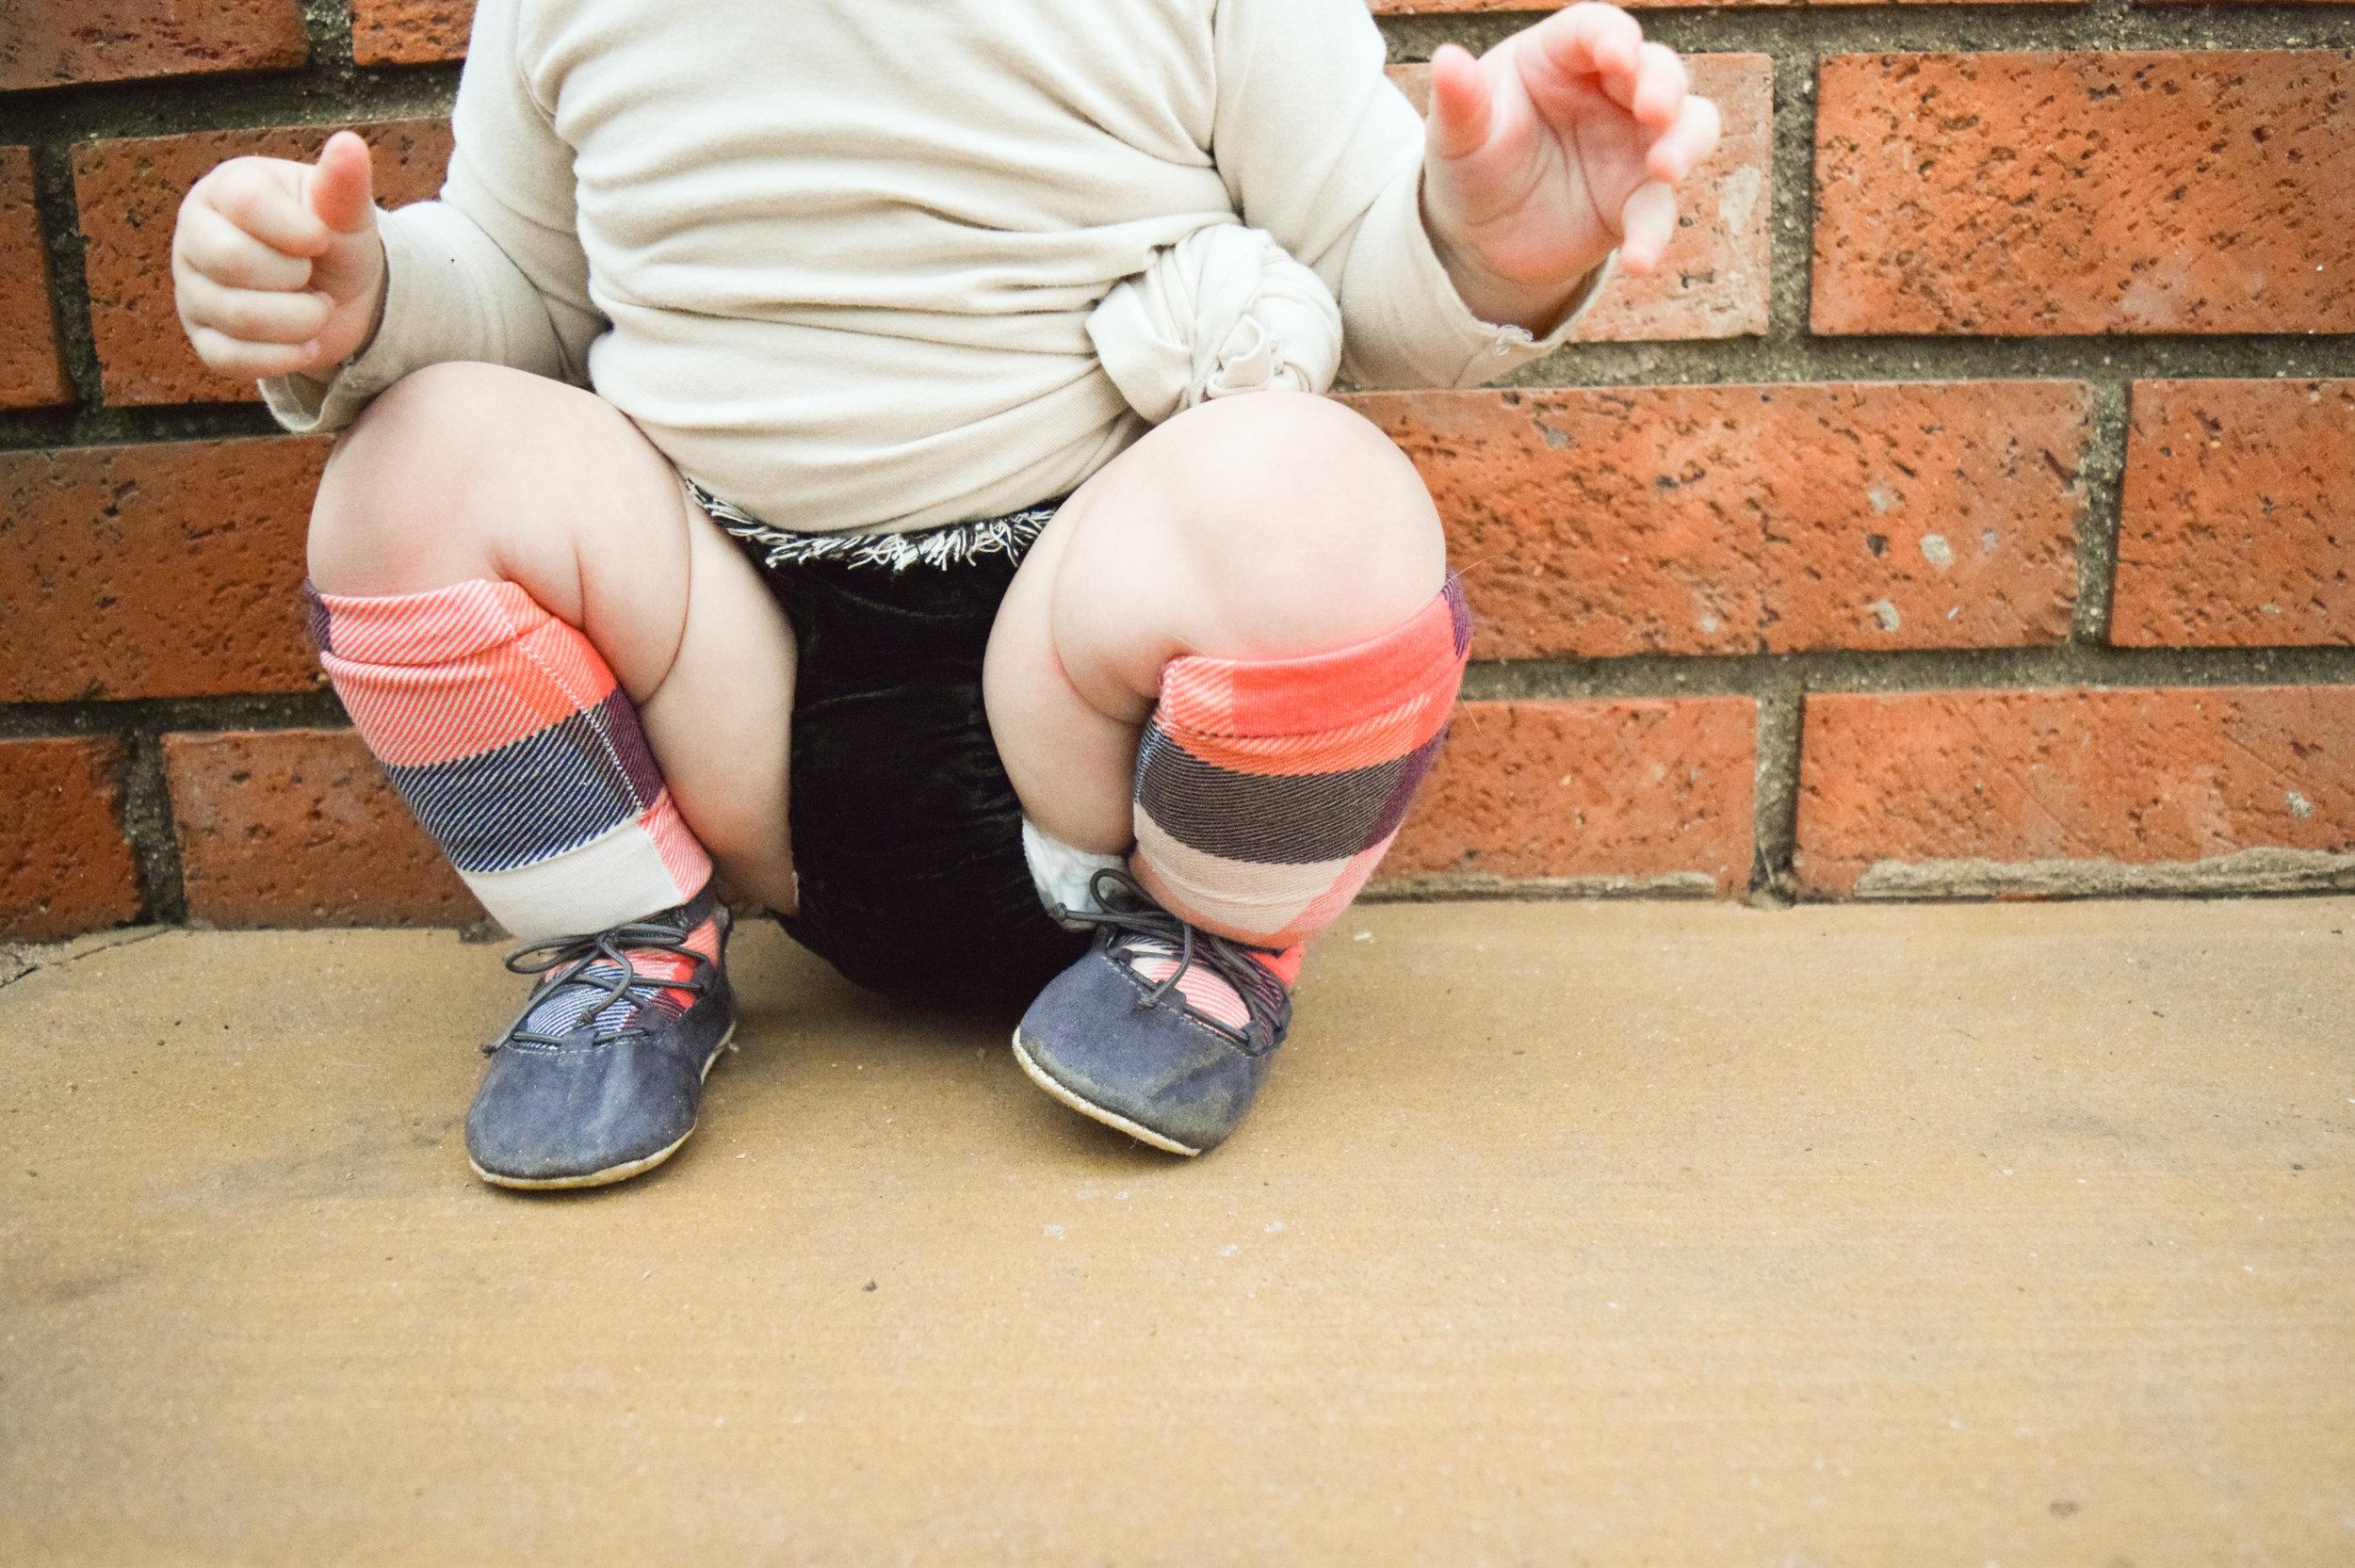 BABY FASHION - knee high plaid babyb socks, velvet baby bloomers with fringe